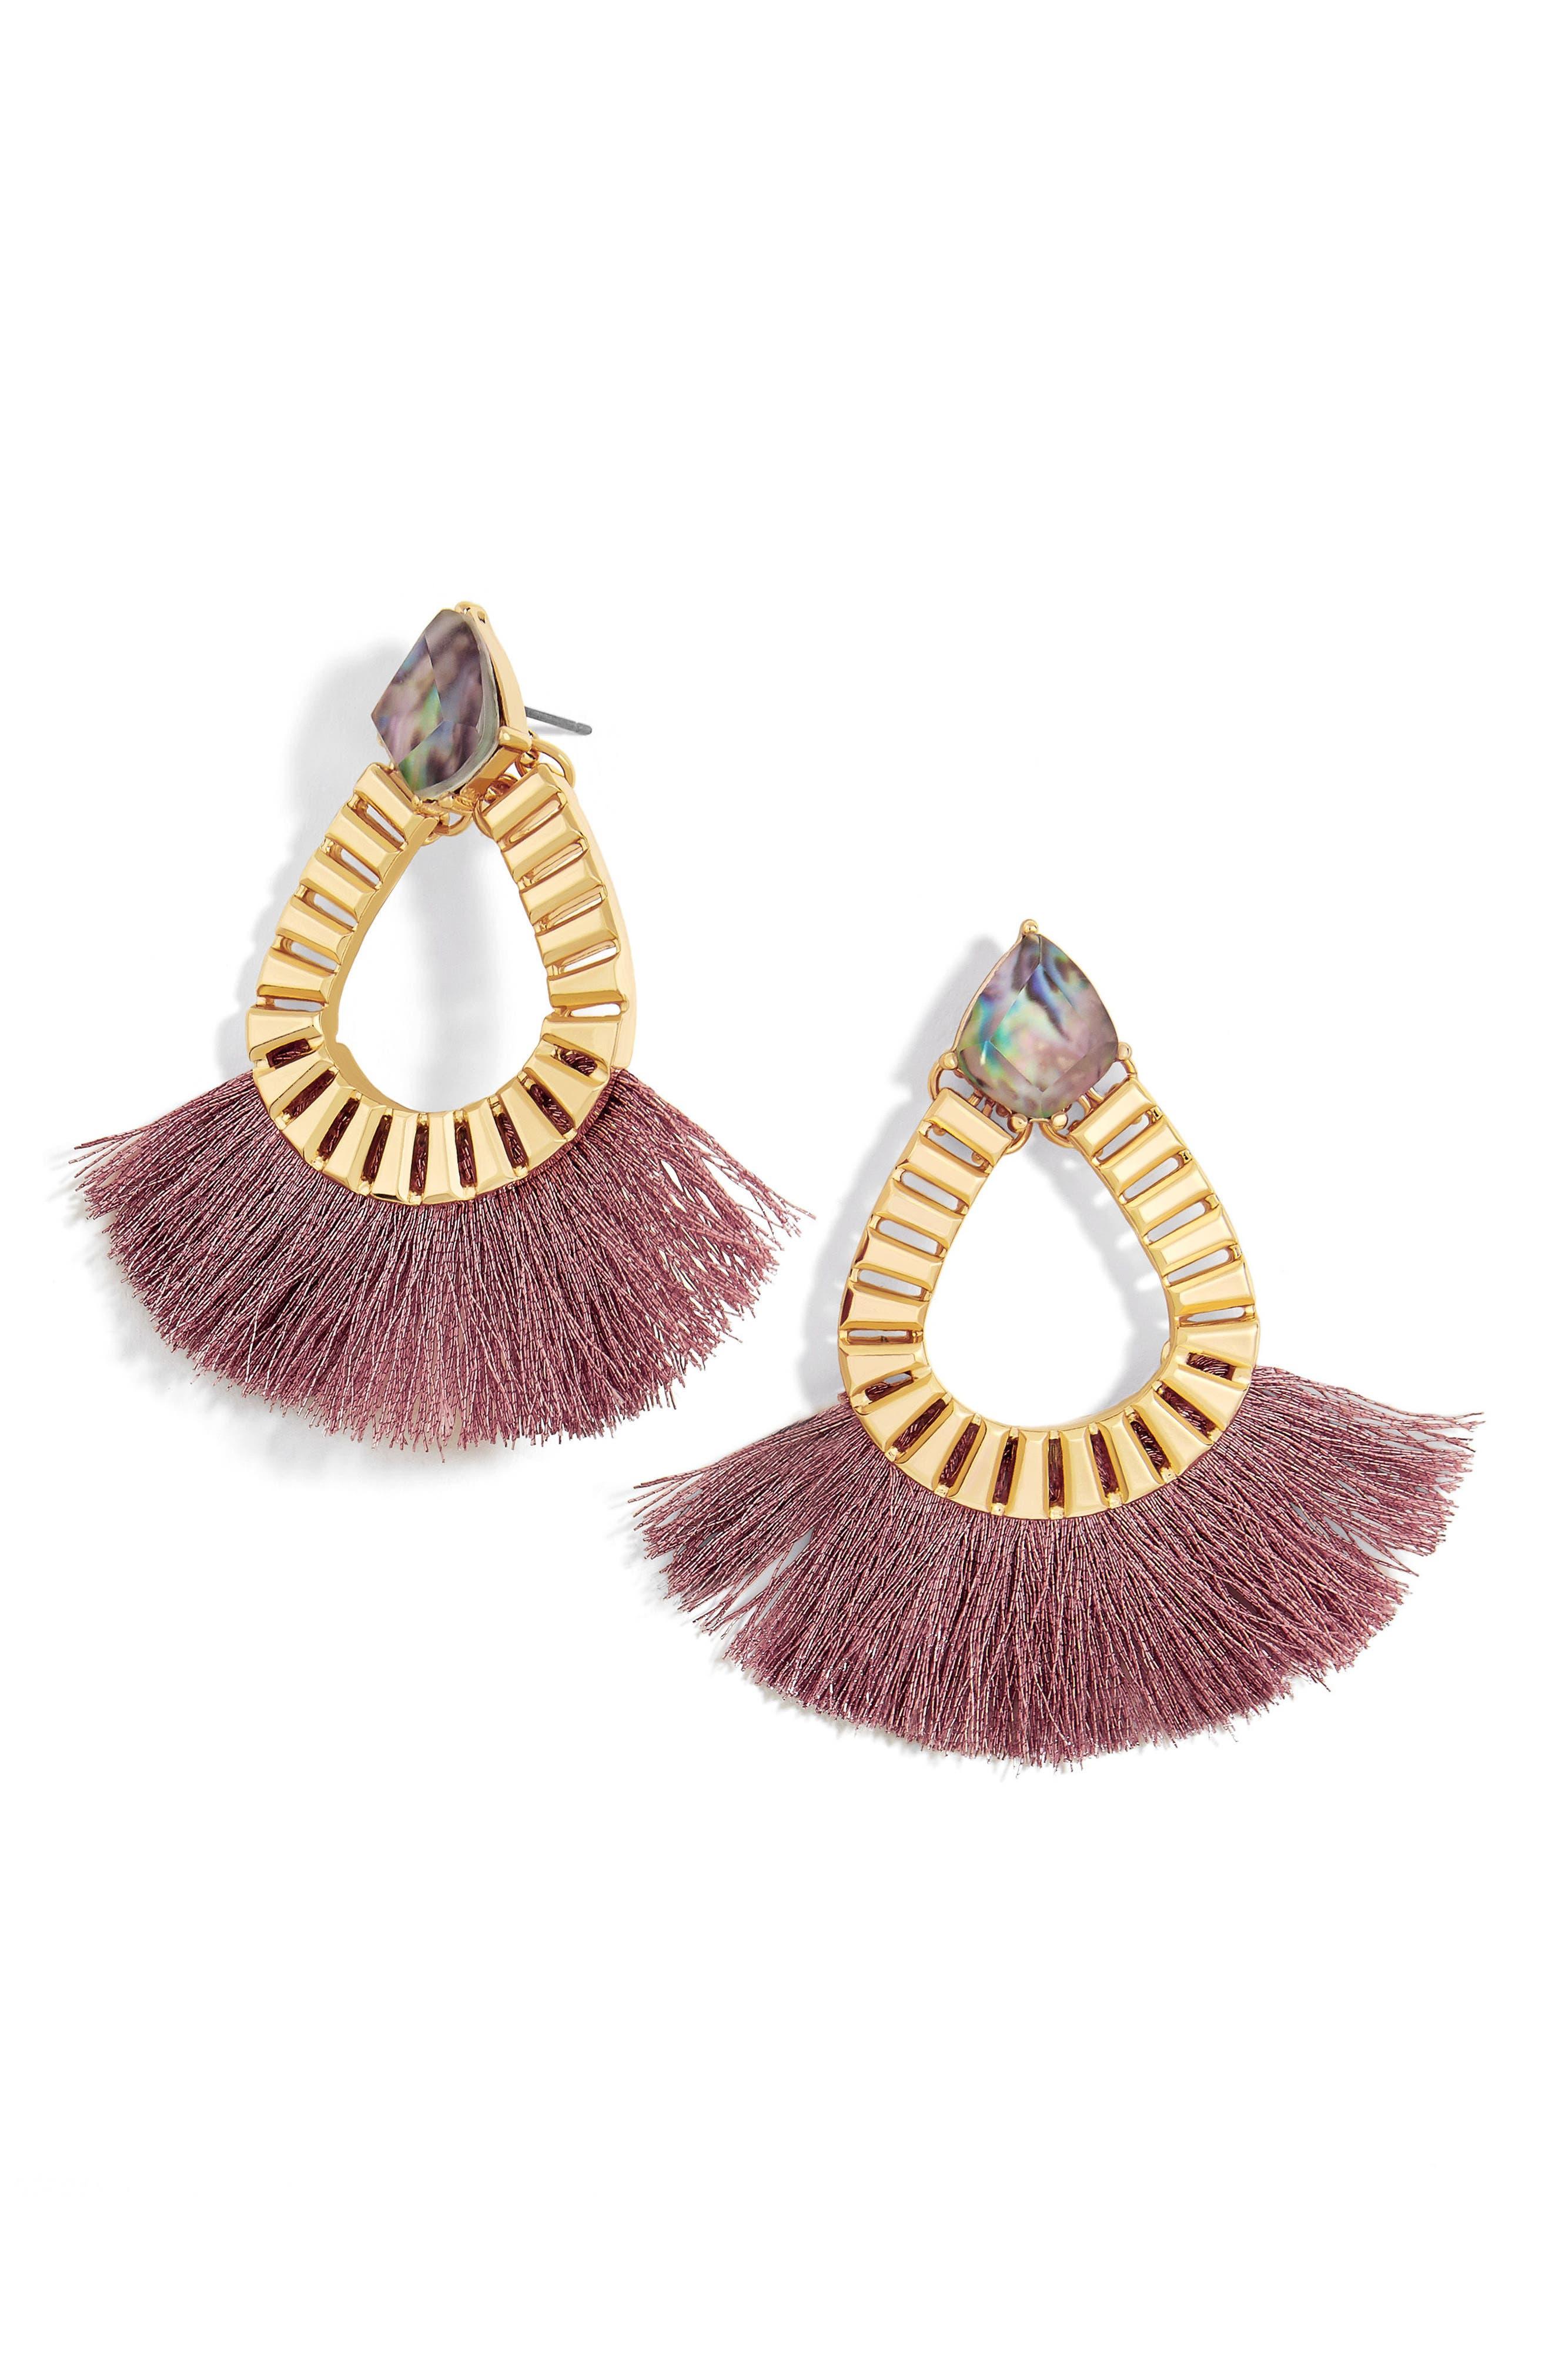 Main Image - BaubleBar Ashira Fringe Earrings